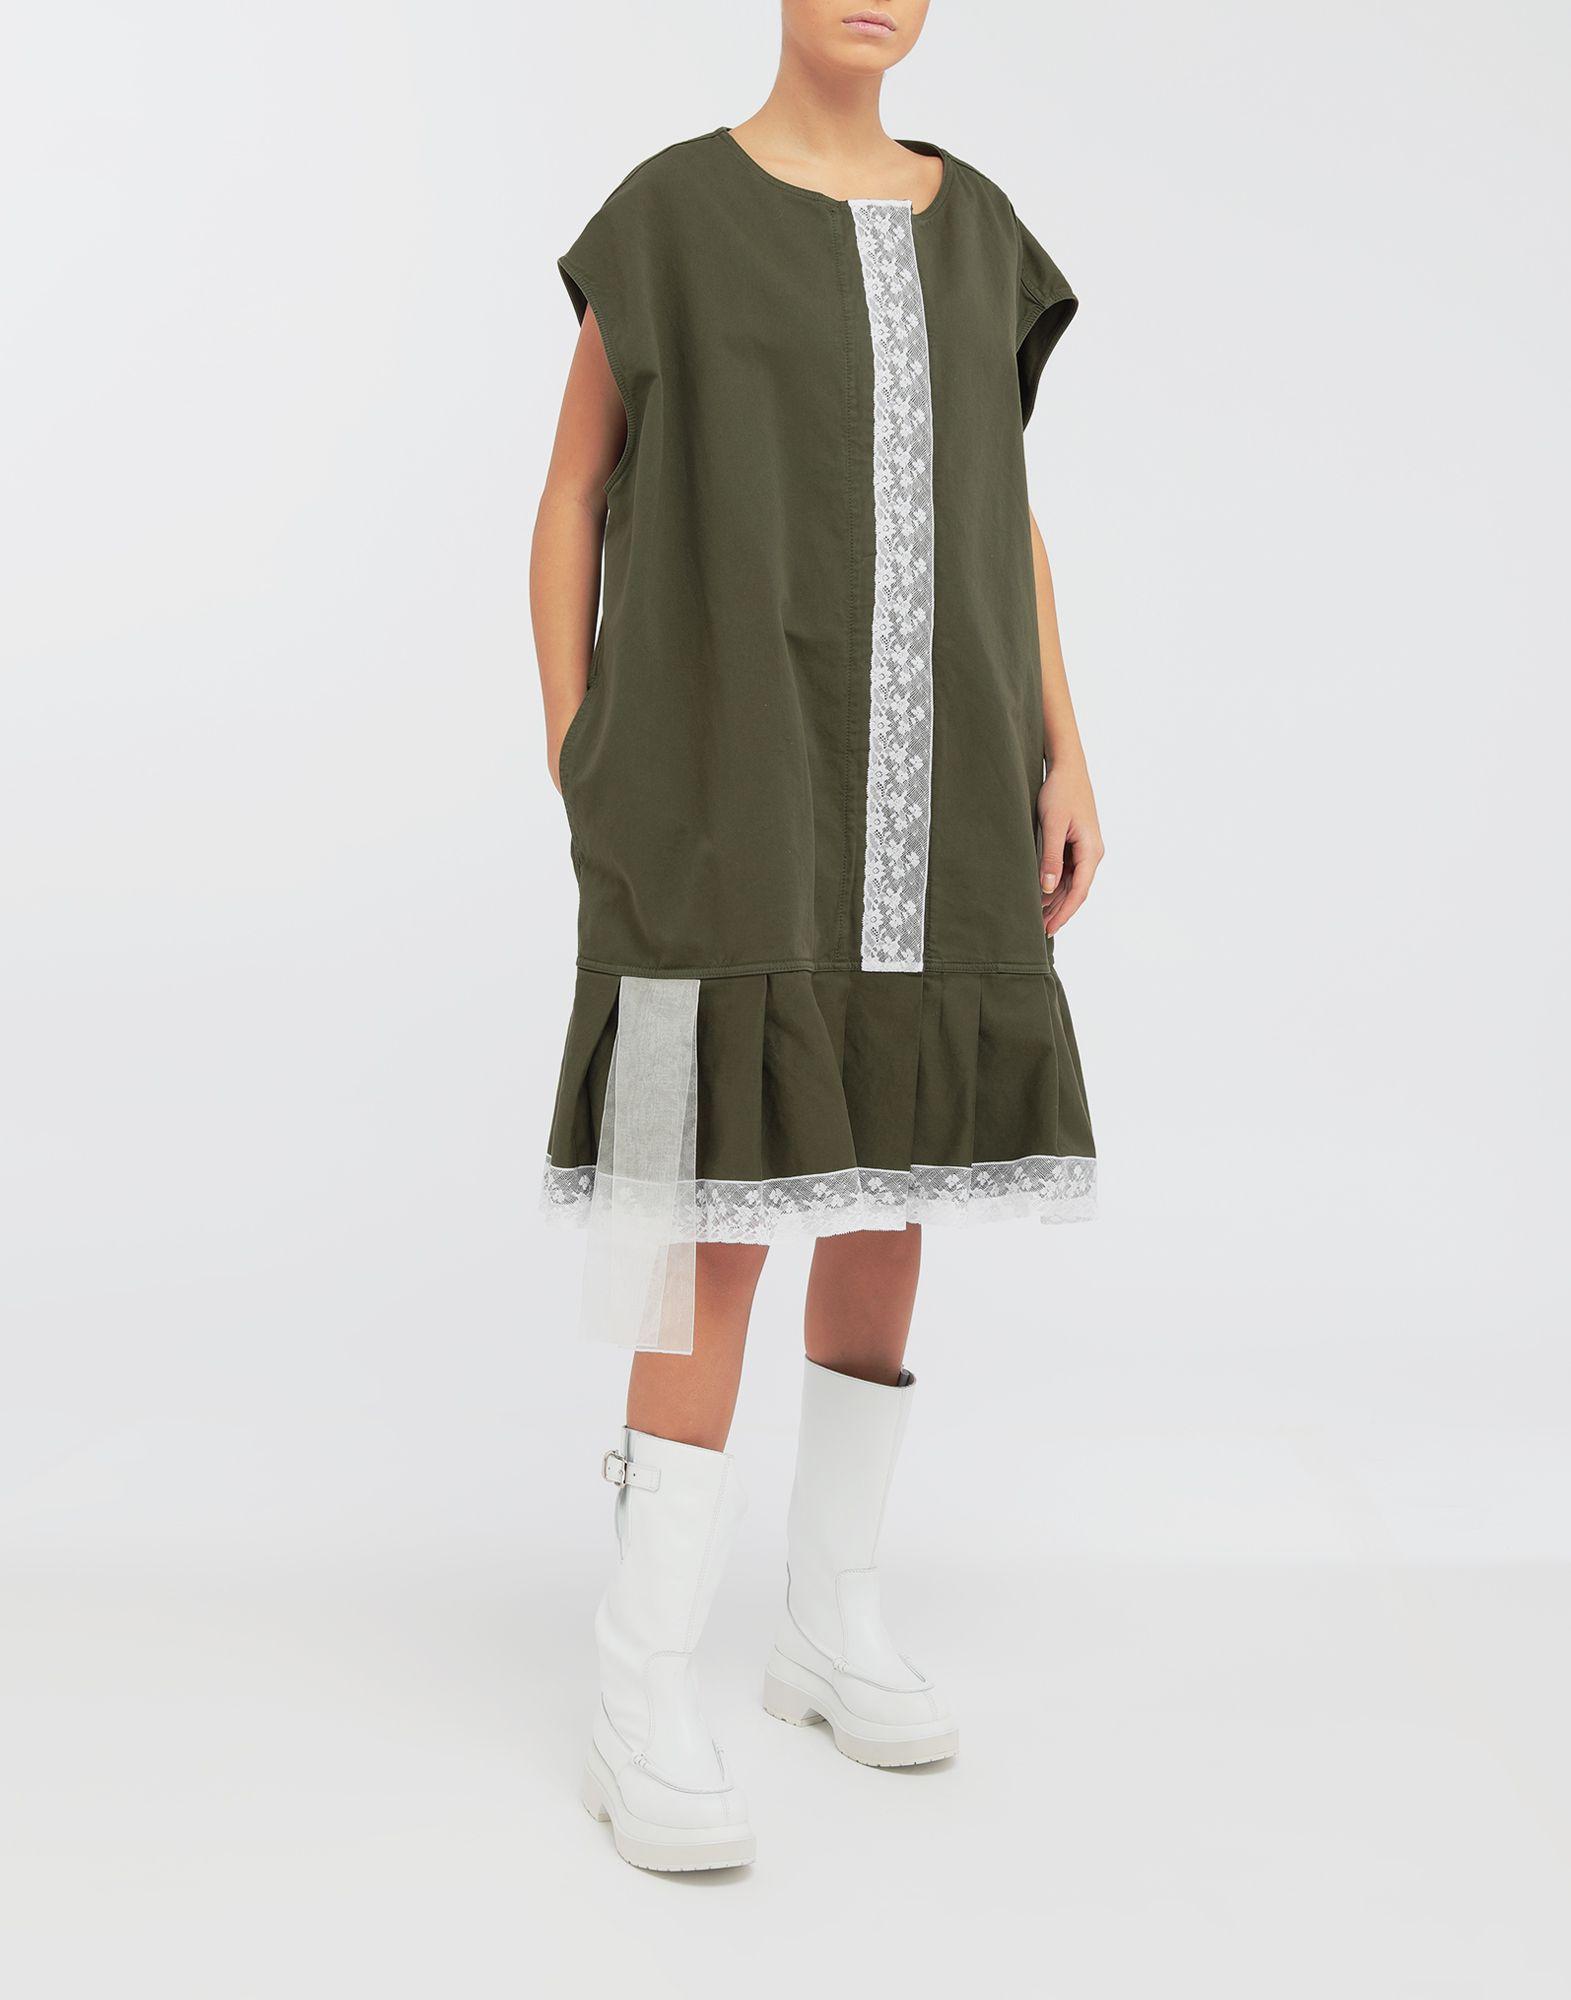 MM6 MAISON MARGIELA Oversized lace-trimmed dress Short dress Woman d